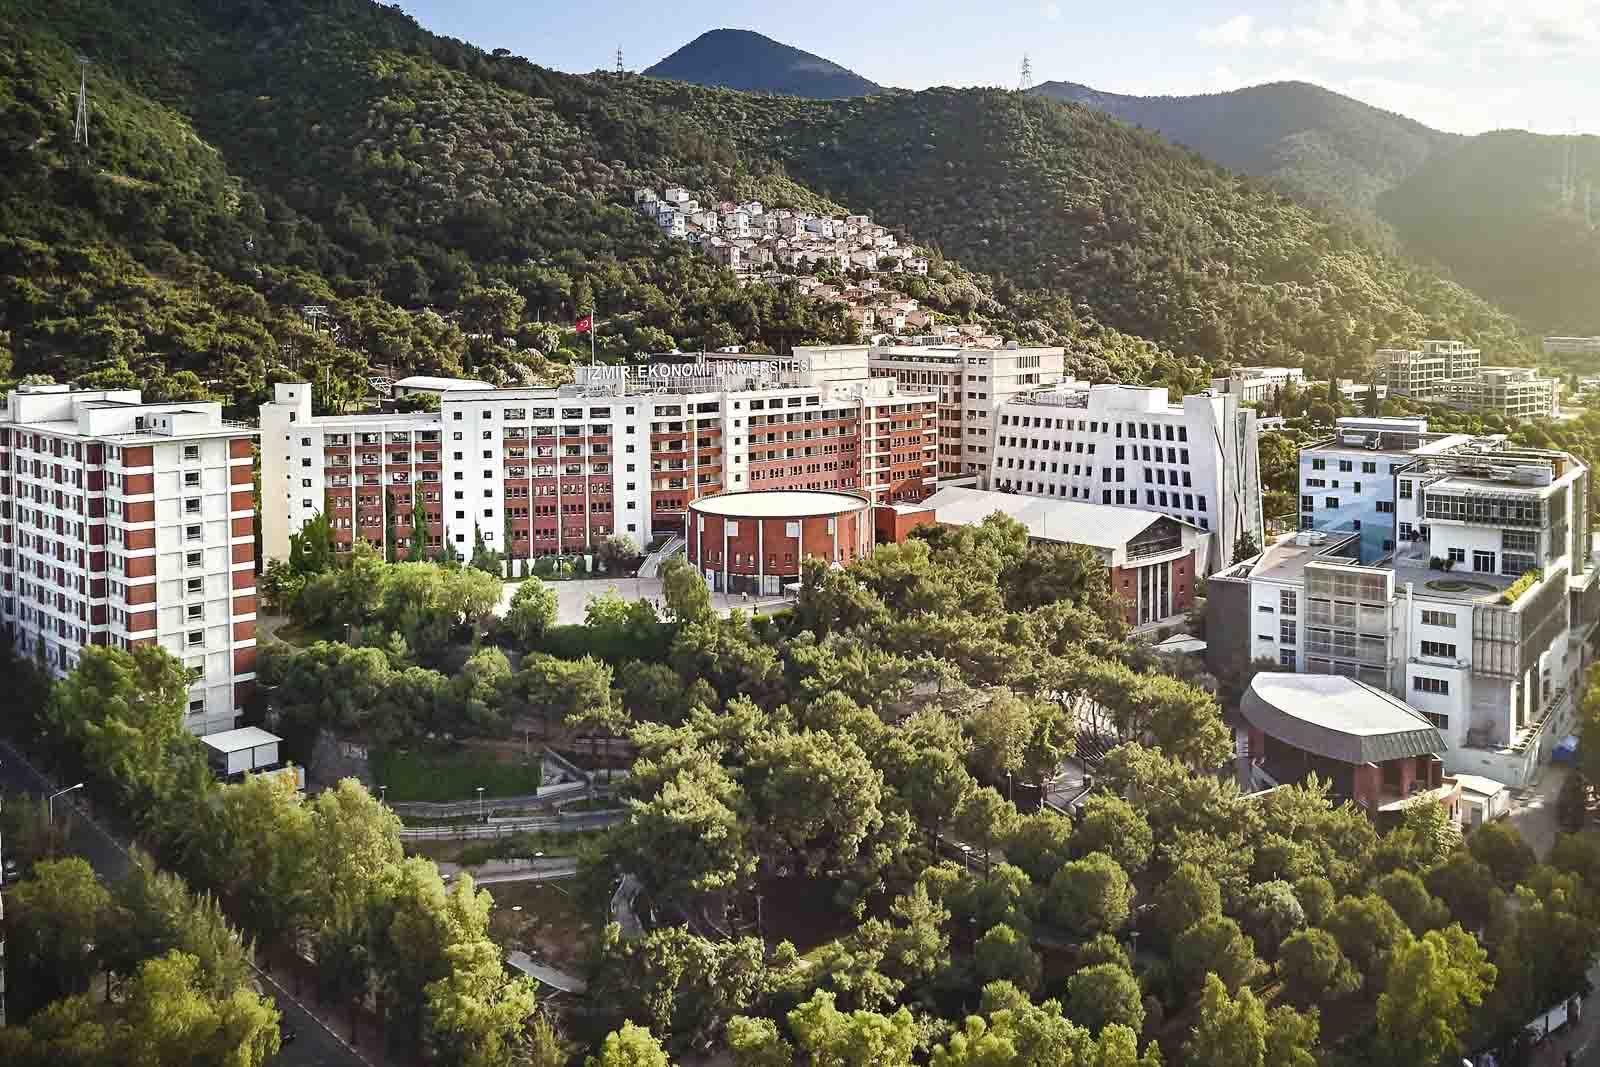 Trees surrounding the lush campus of Izmir University of Economics